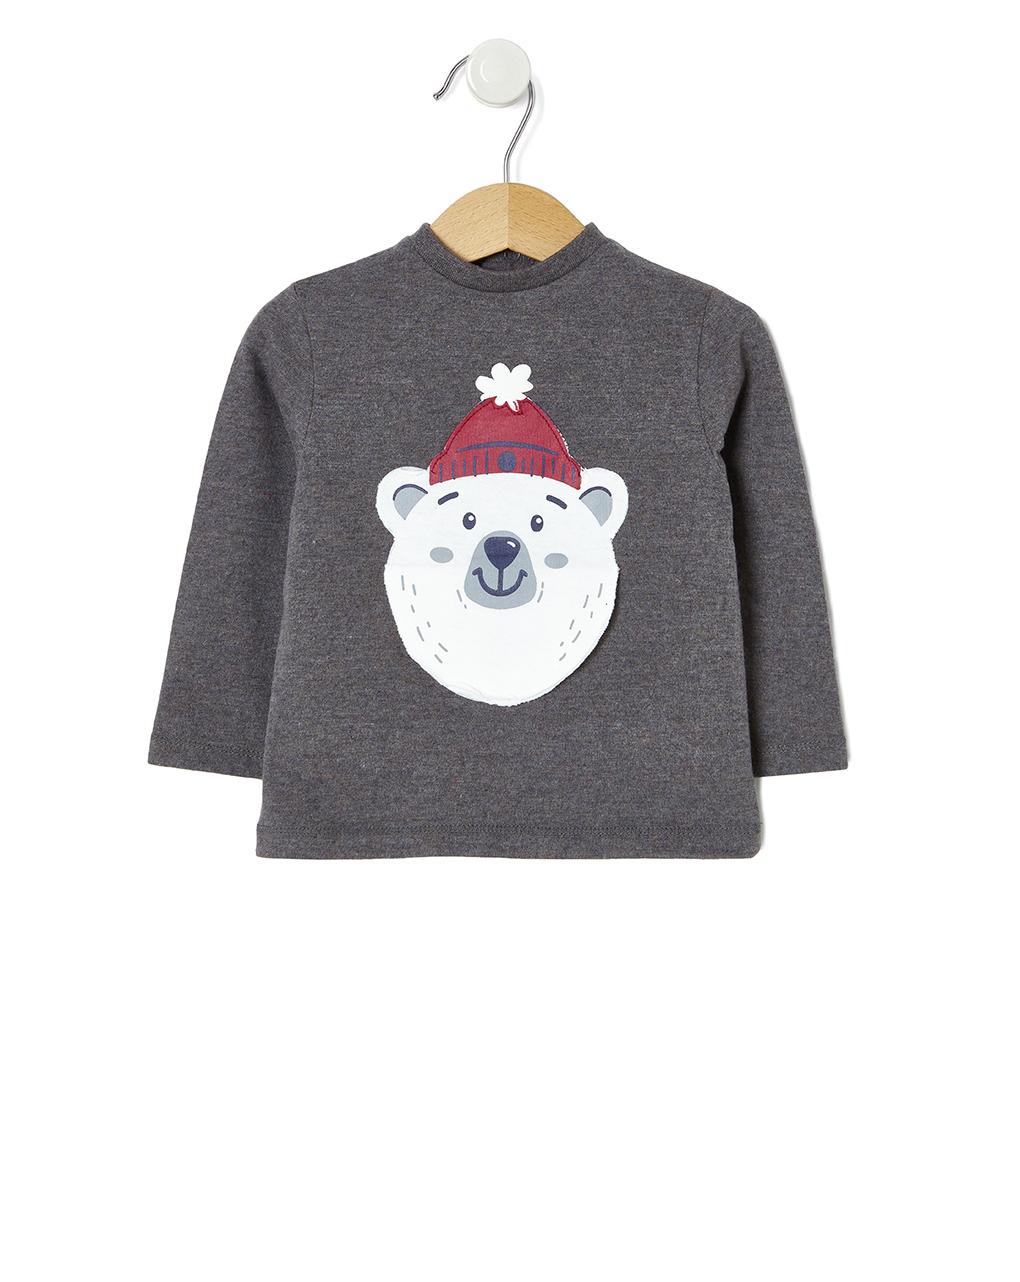 T-shirt Γκρι με Αρκουδάκι για Αγόρι